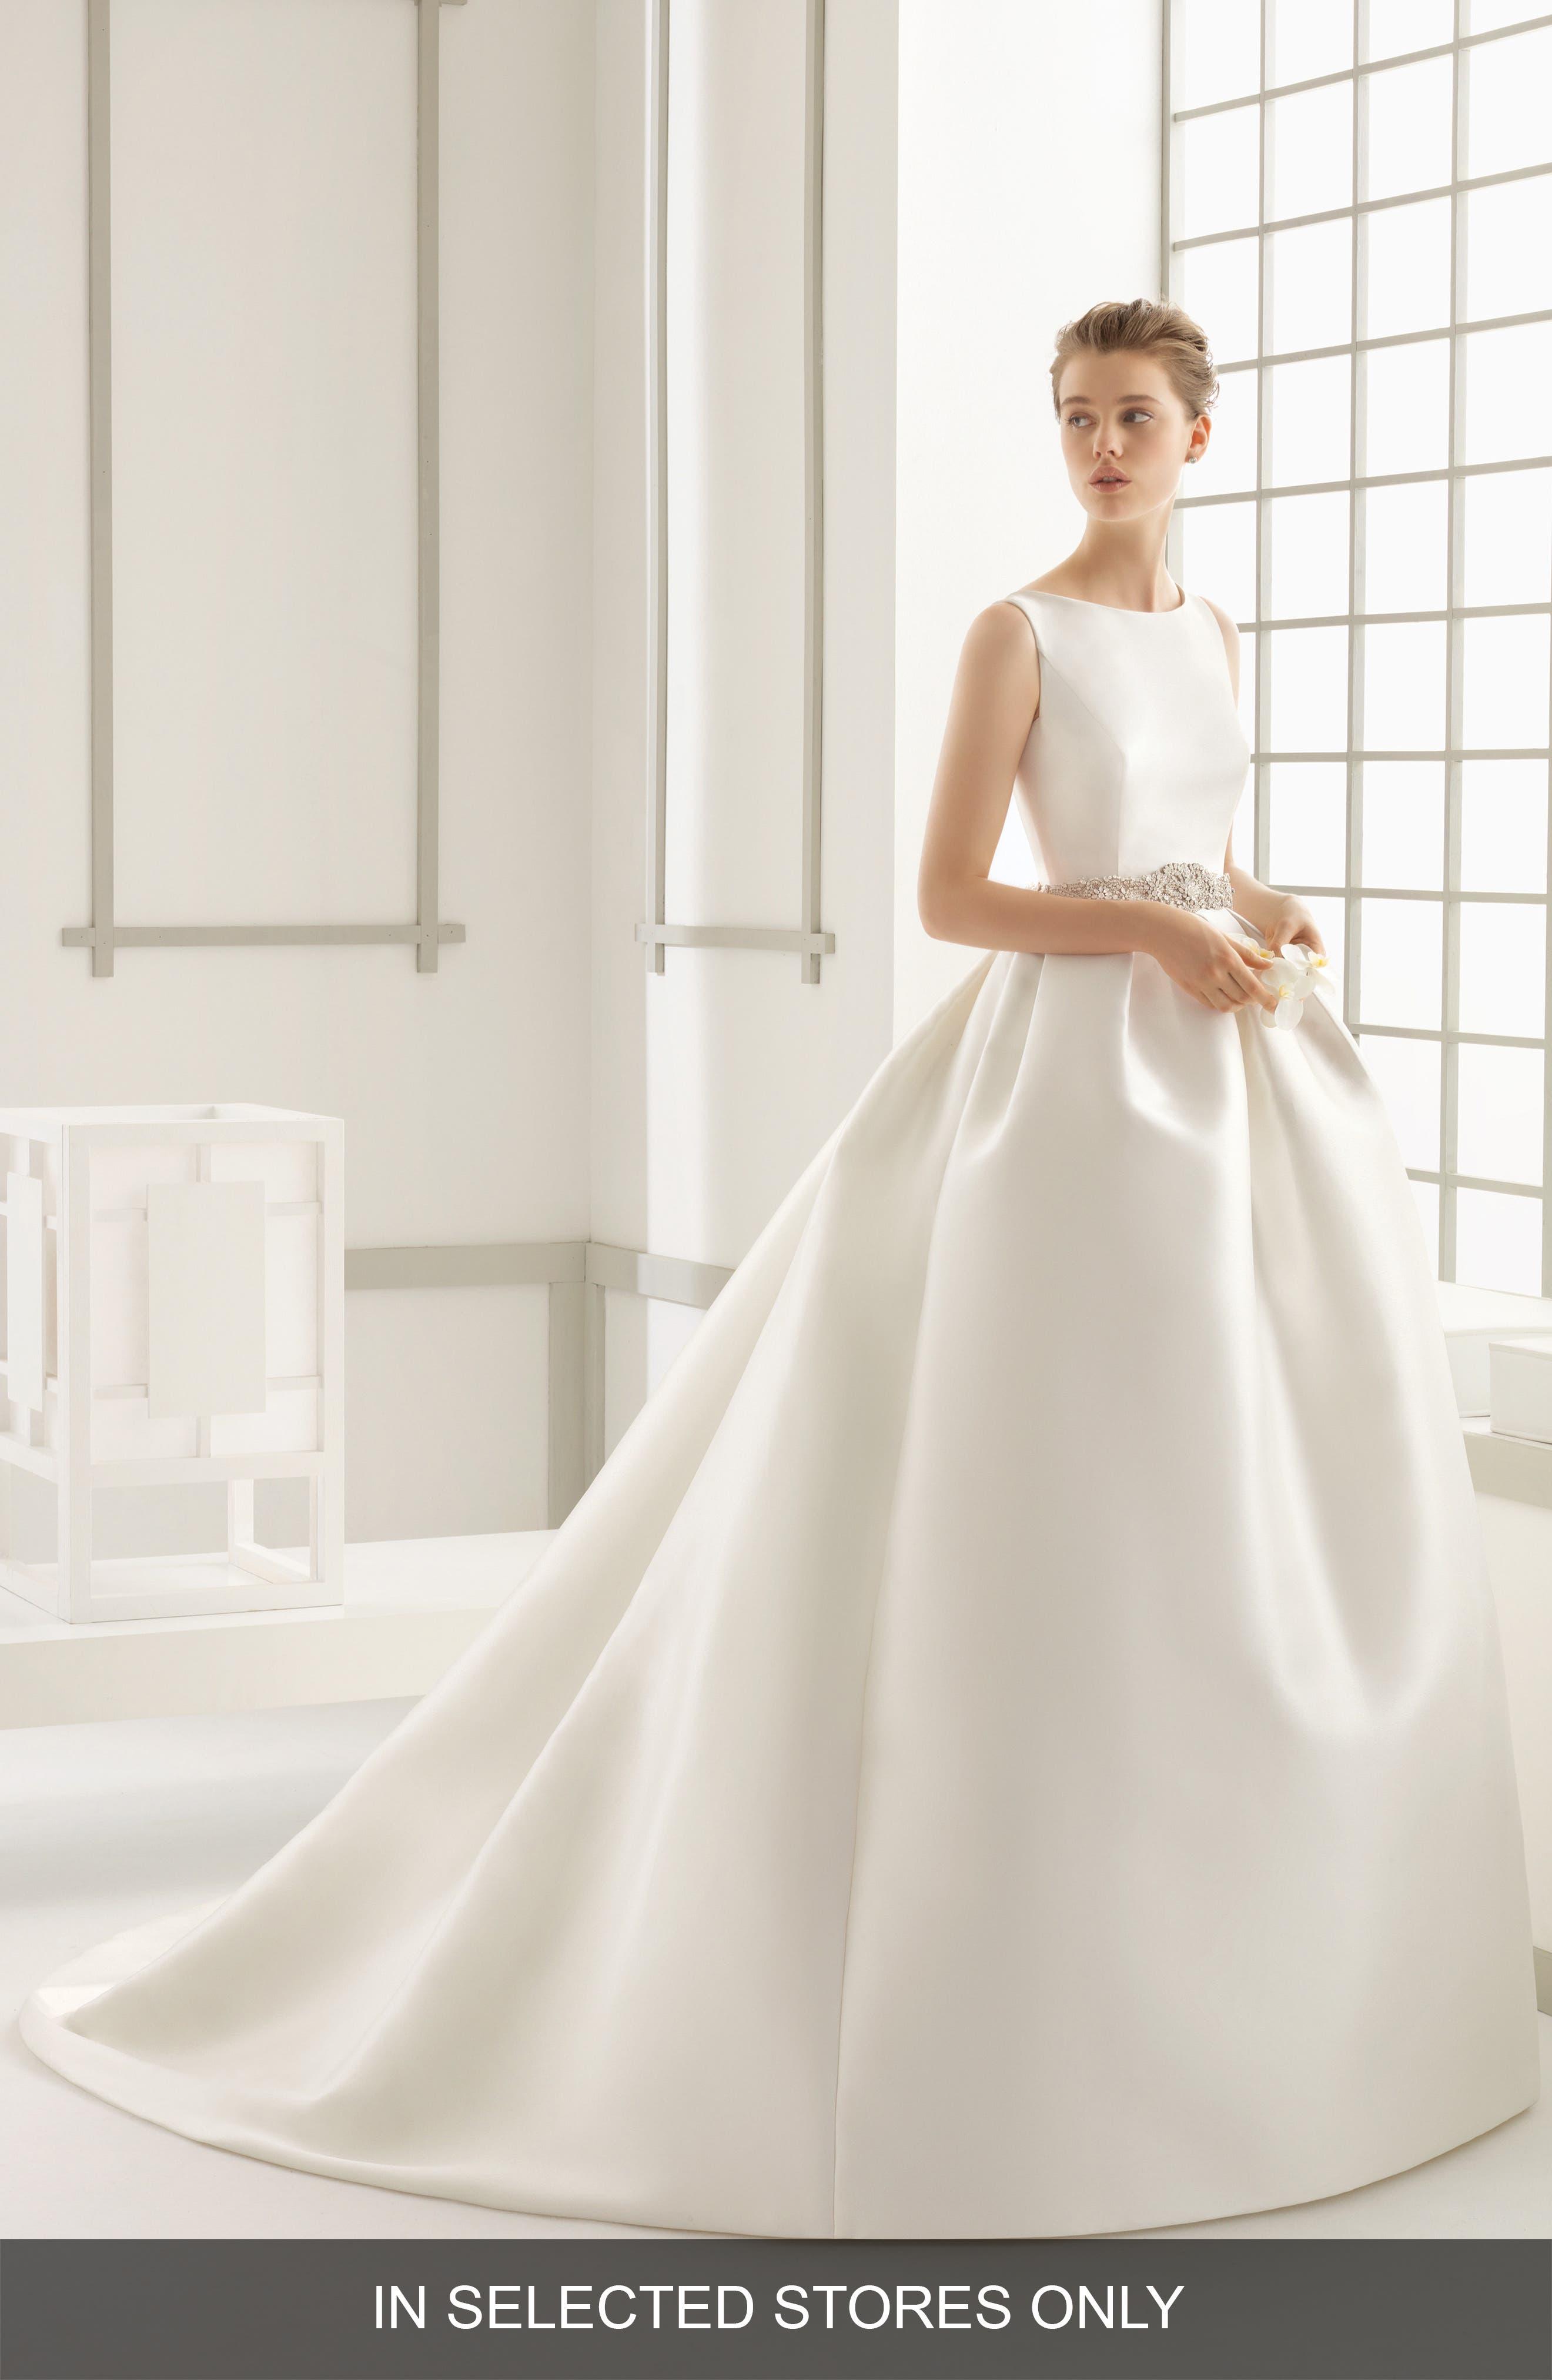 Main Image - Rosa Clara Couture Delfos Beaded Back Ballgown Dress